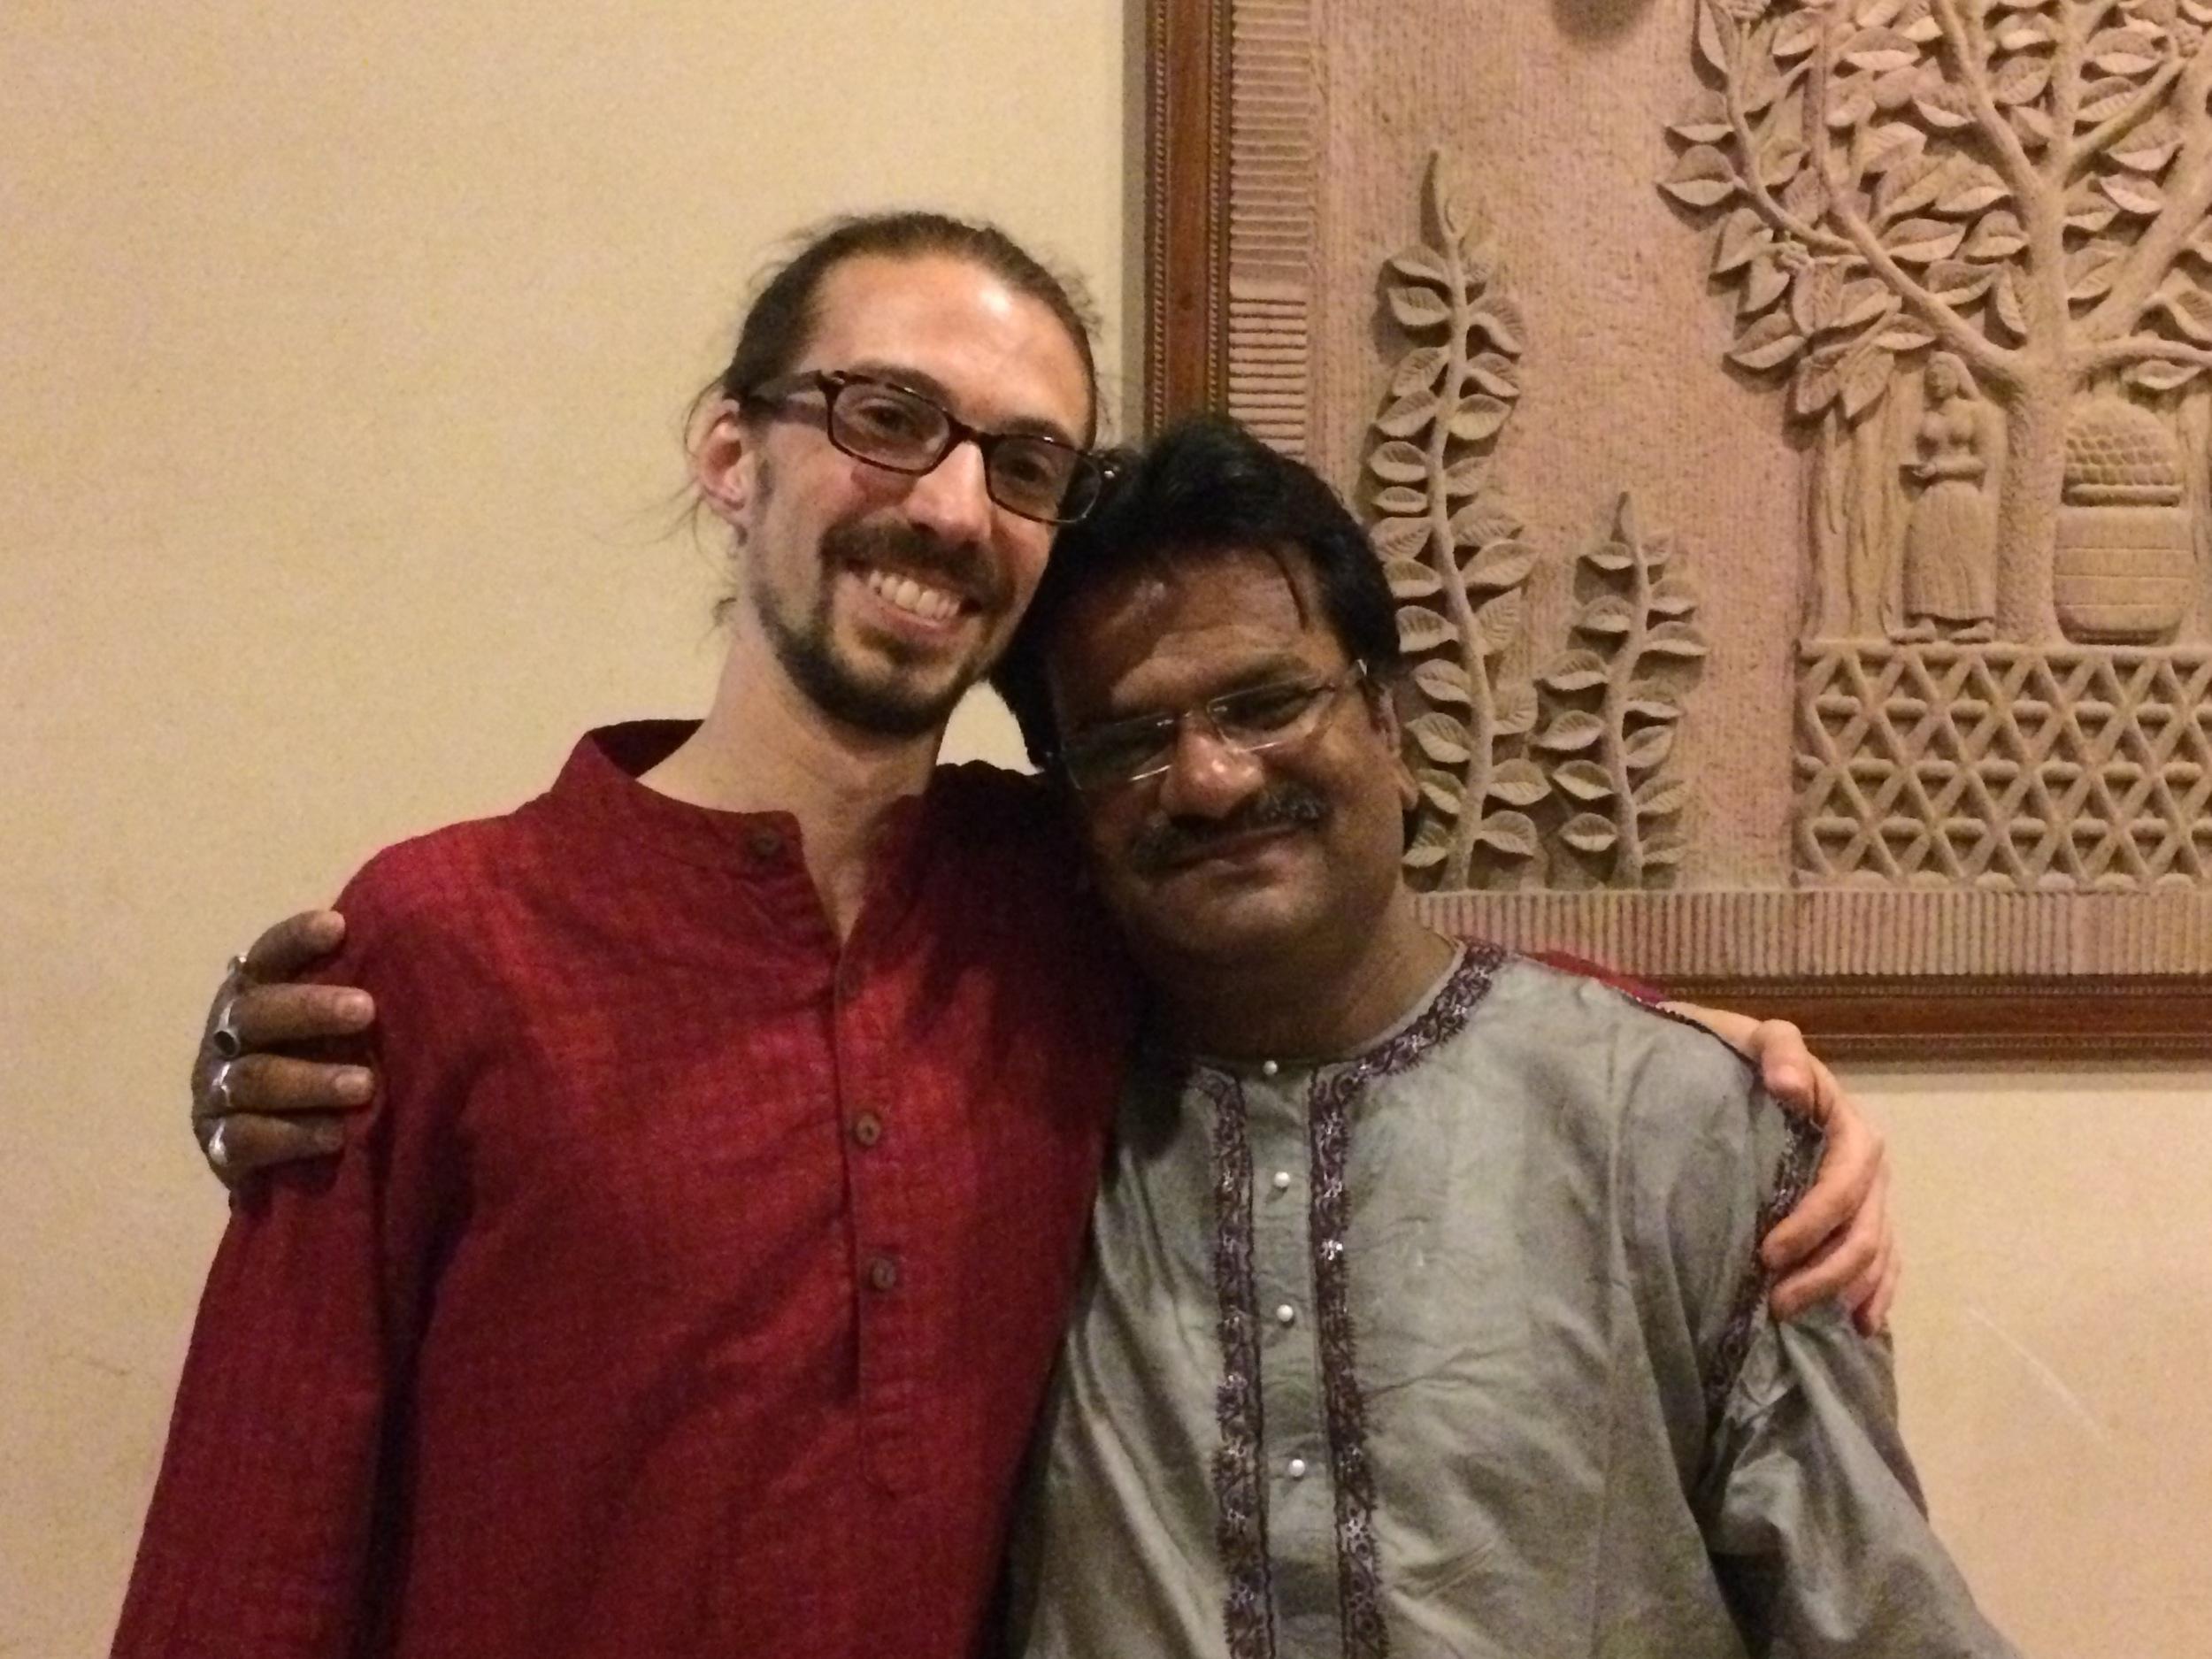 Dan with his tabla guru, PanditKuber Nath Mishra, Varanasi, March 2015.